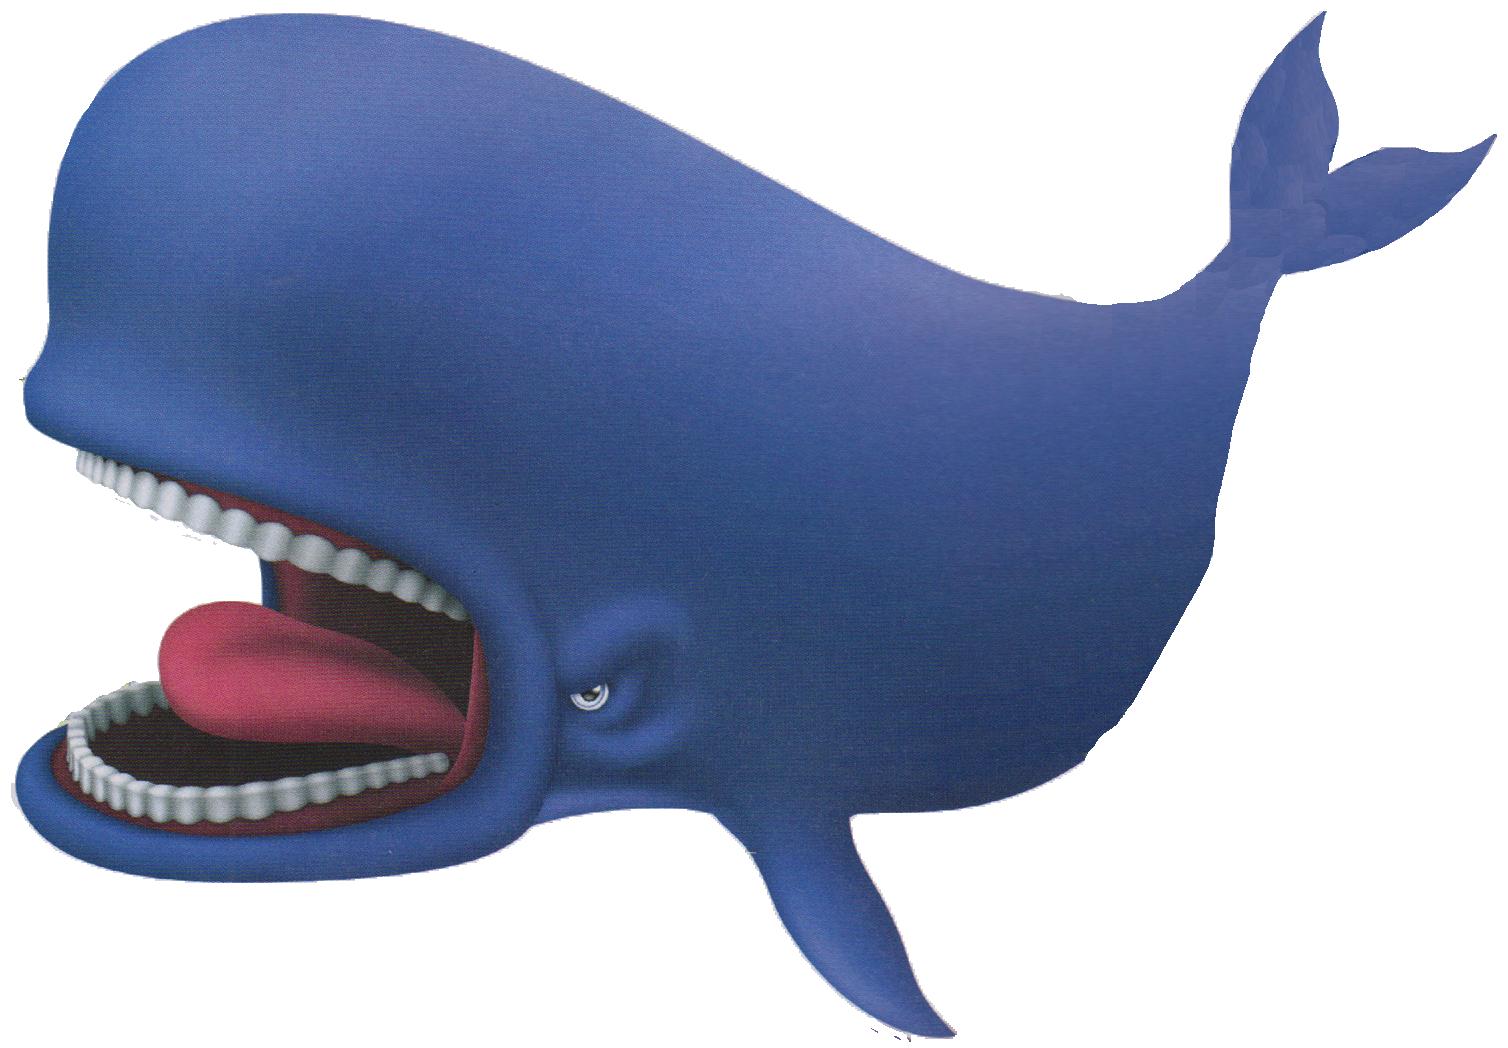 Clipart whale destiny. Image monstro khbbsfm png